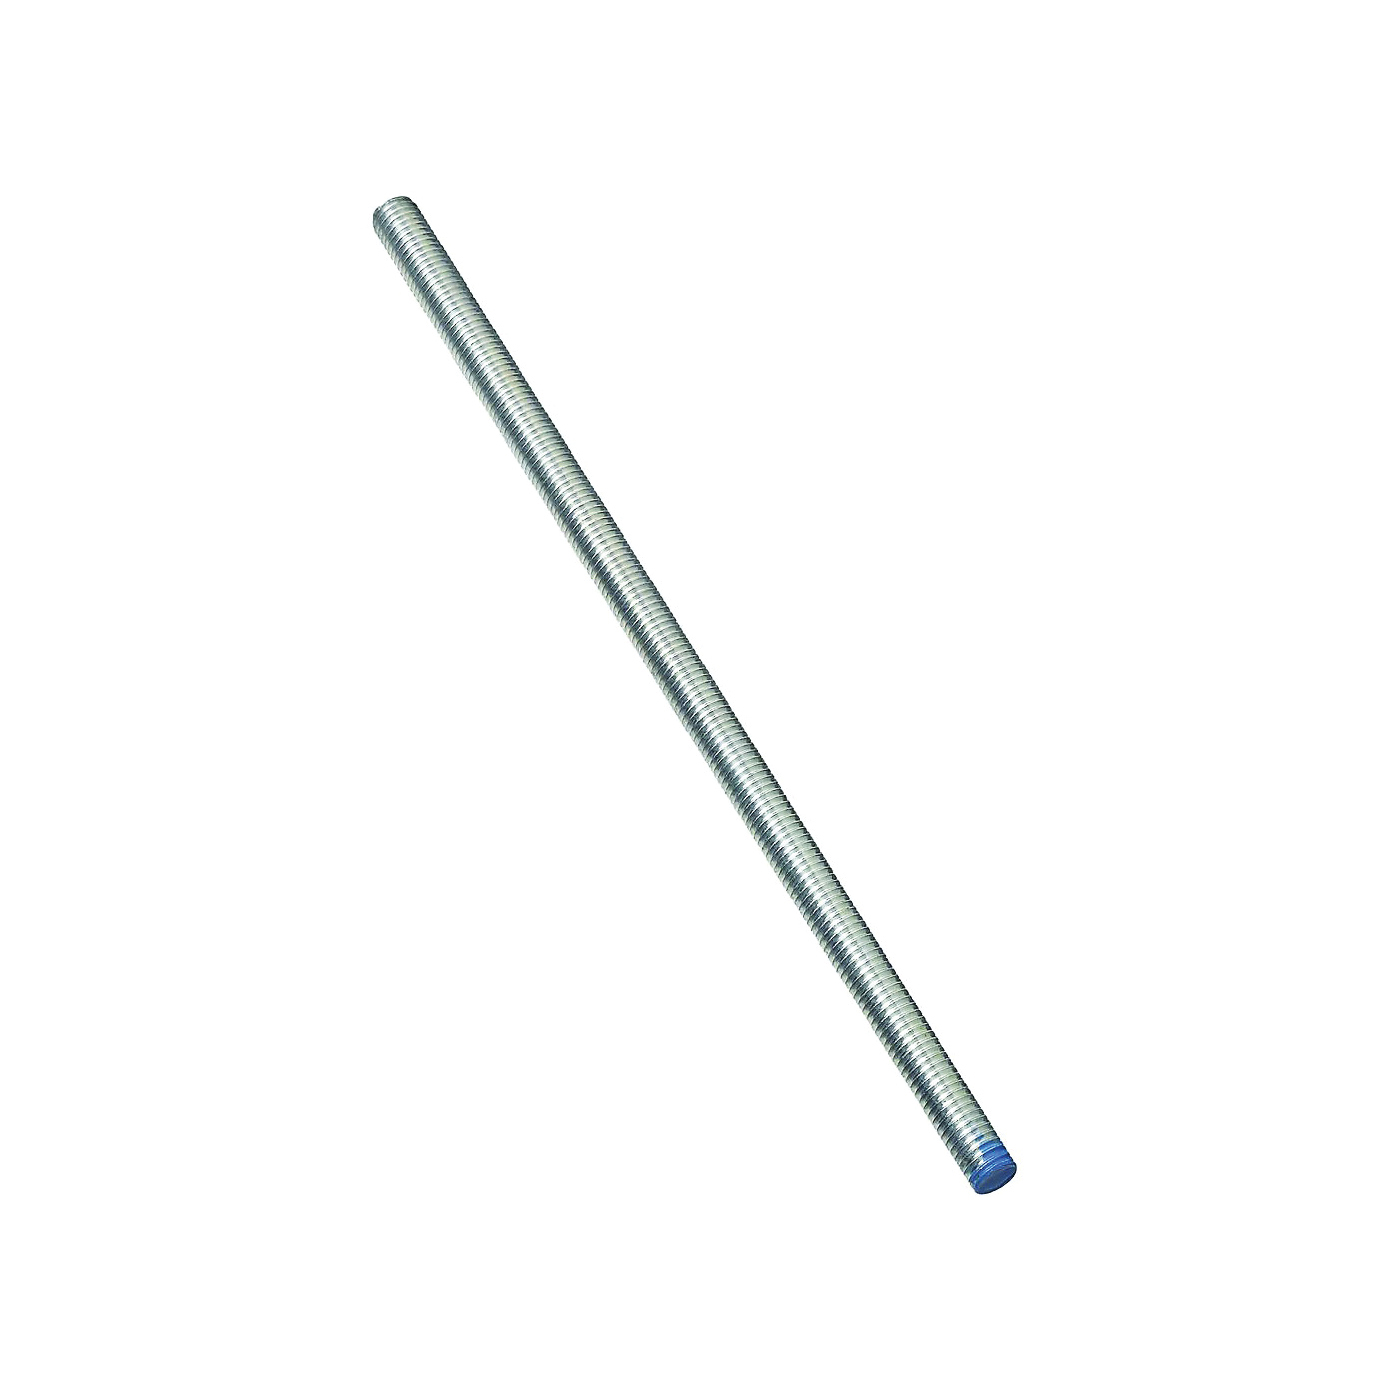 Picture of Stanley Hardware 179457 Threaded Rod, 1/2-13 Thread, 24 in L, A Grade, Steel, Zinc, UNC Thread